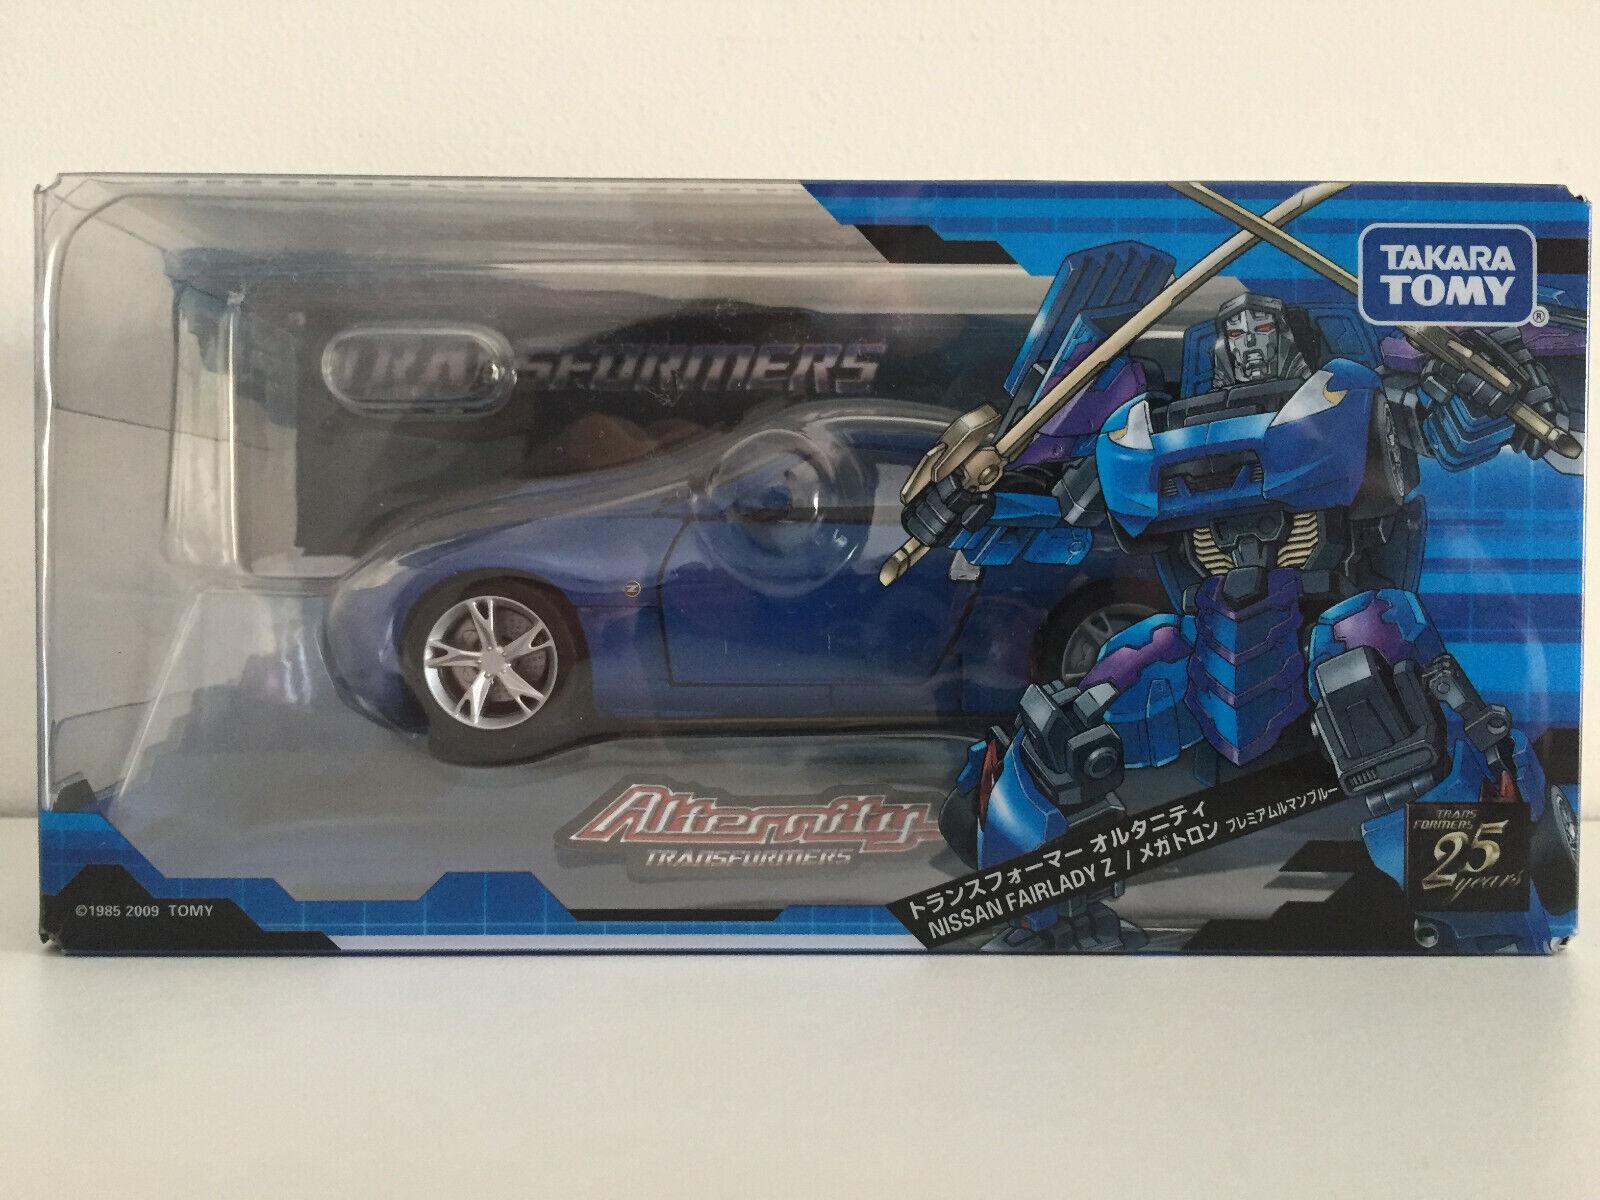 [NIB] Takara Transformers Alternity A-02 NISSAN Fairlady Z   Megatron (bluee)